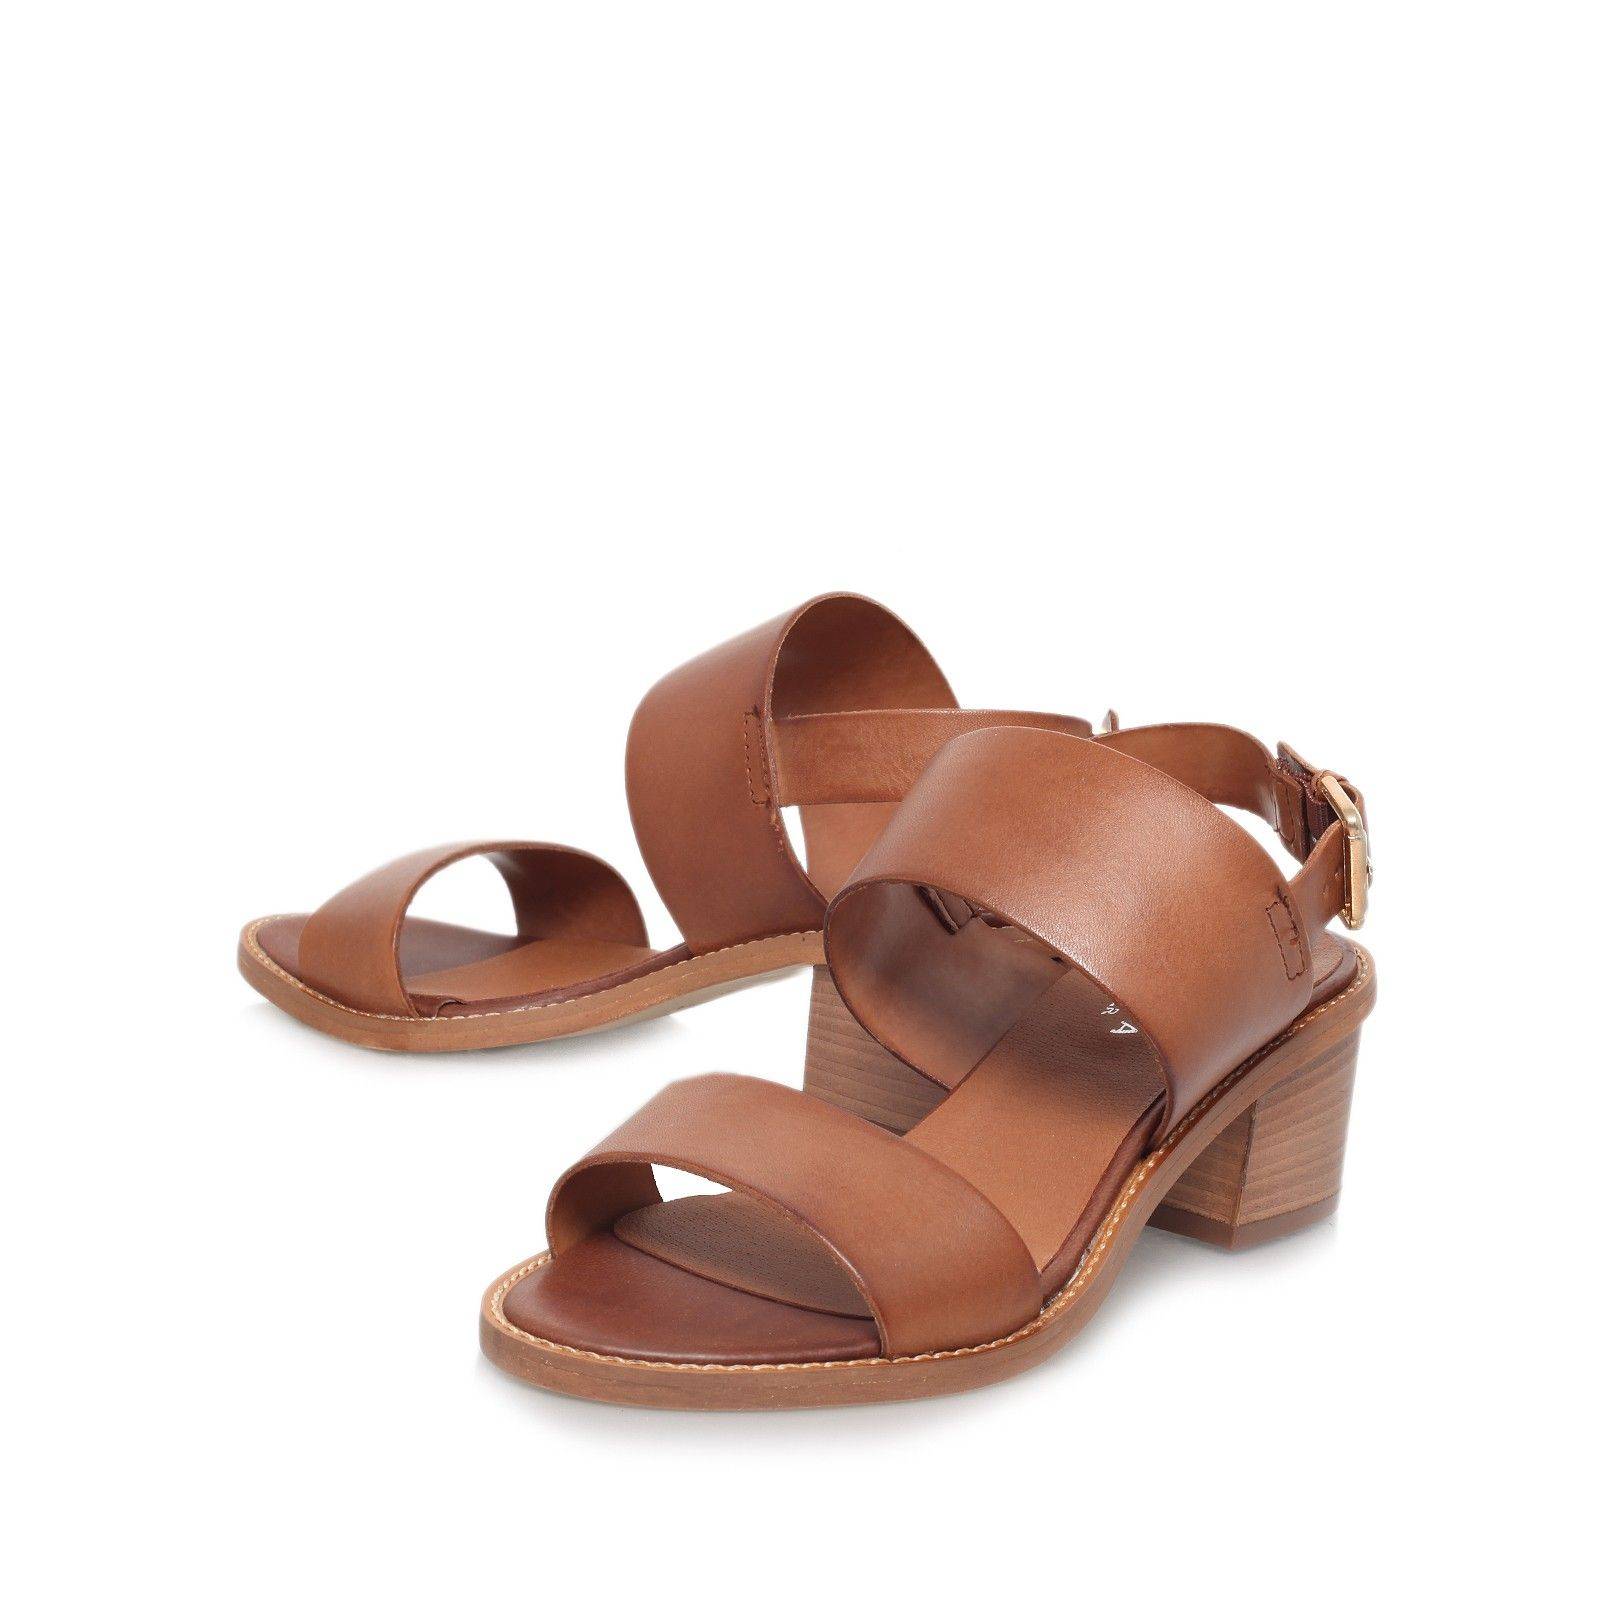 Womens sandals mid heel - Kimberly Tan Mid Heel Sandals From Carvela Kurt Geiger